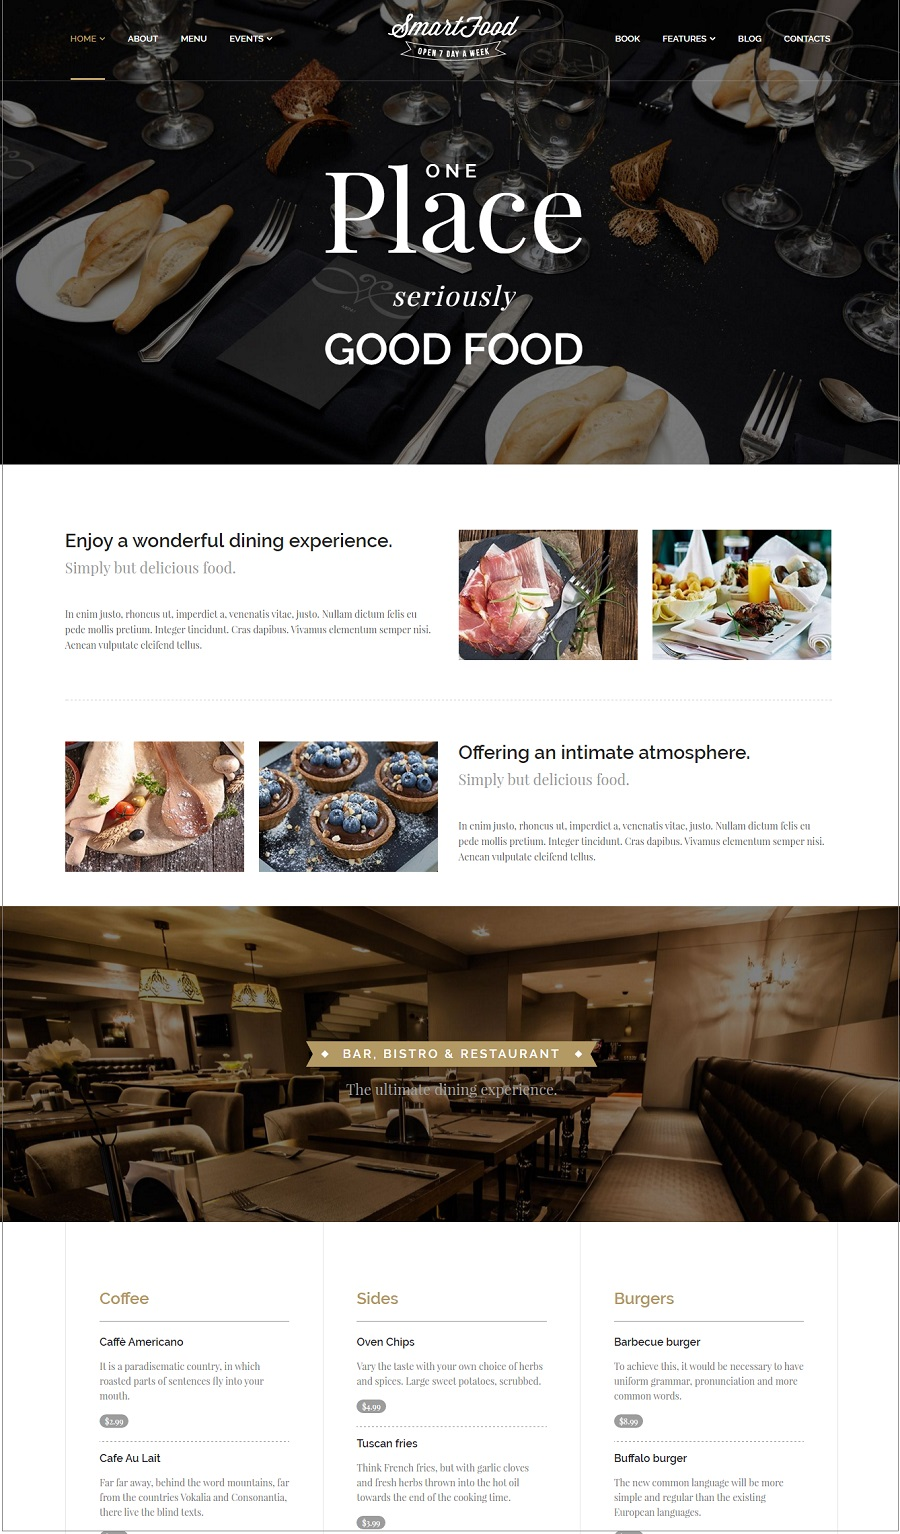 smartfood restuarant wordpress theme